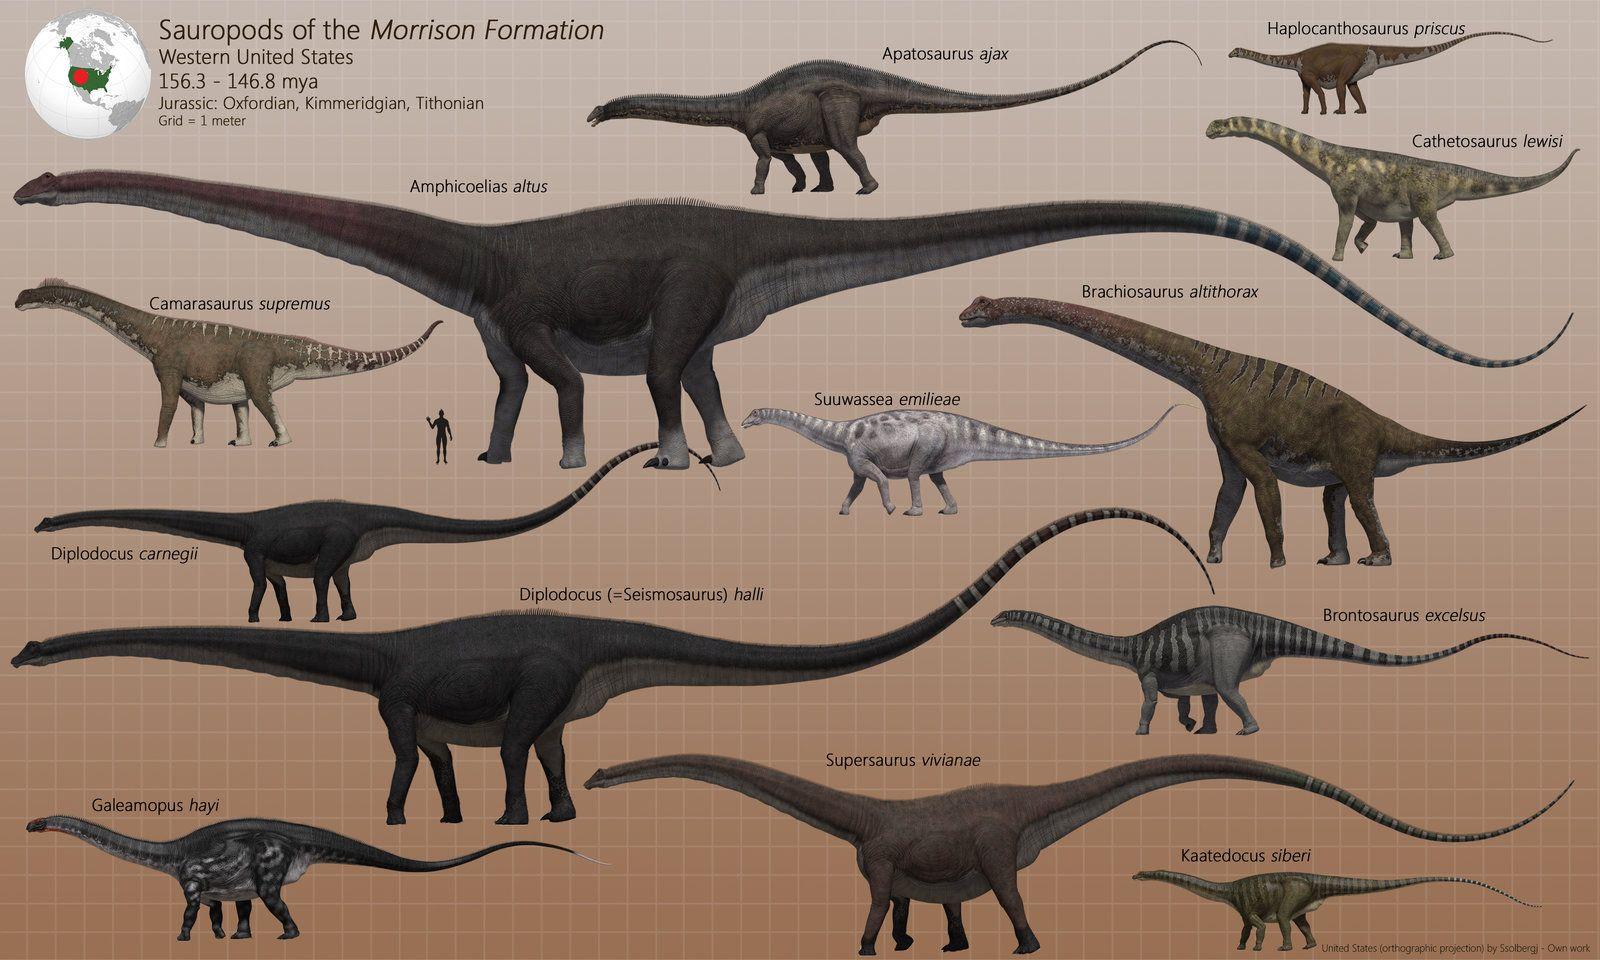 apatosaurus vs diplodocus - 1153×692